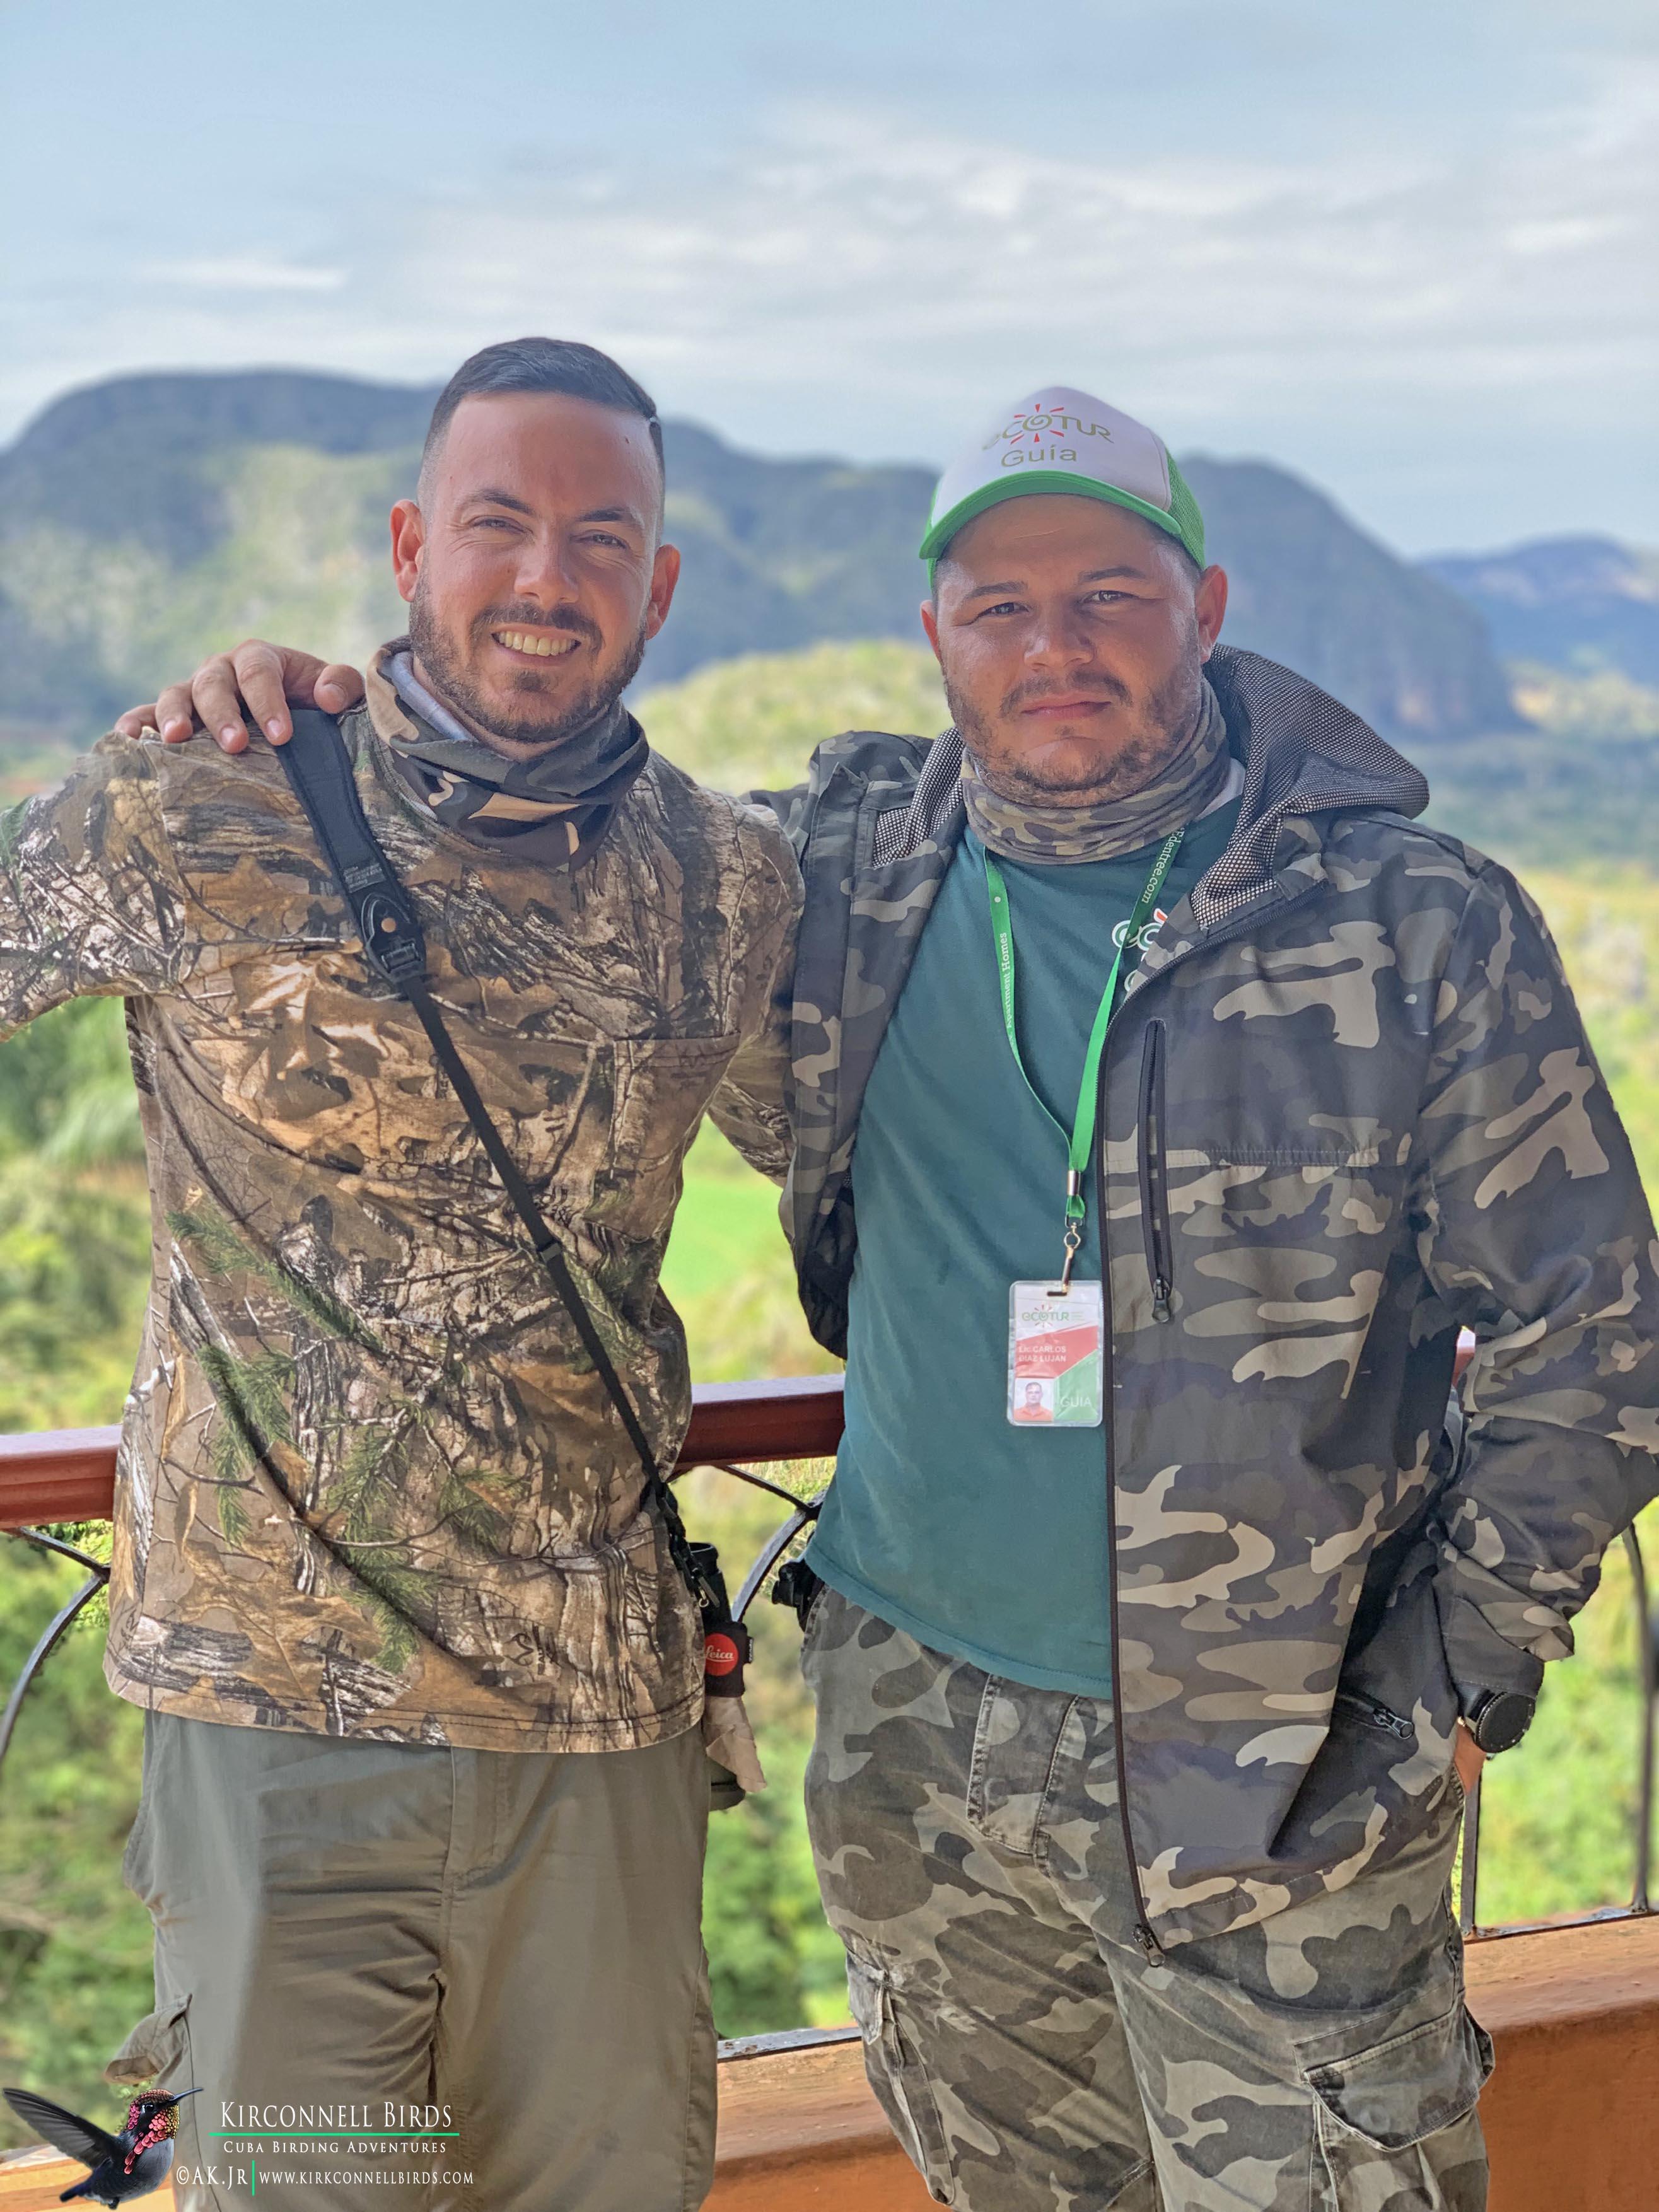 11-Birding-in-Cuba_Arturo-Kirkconnell-Jr